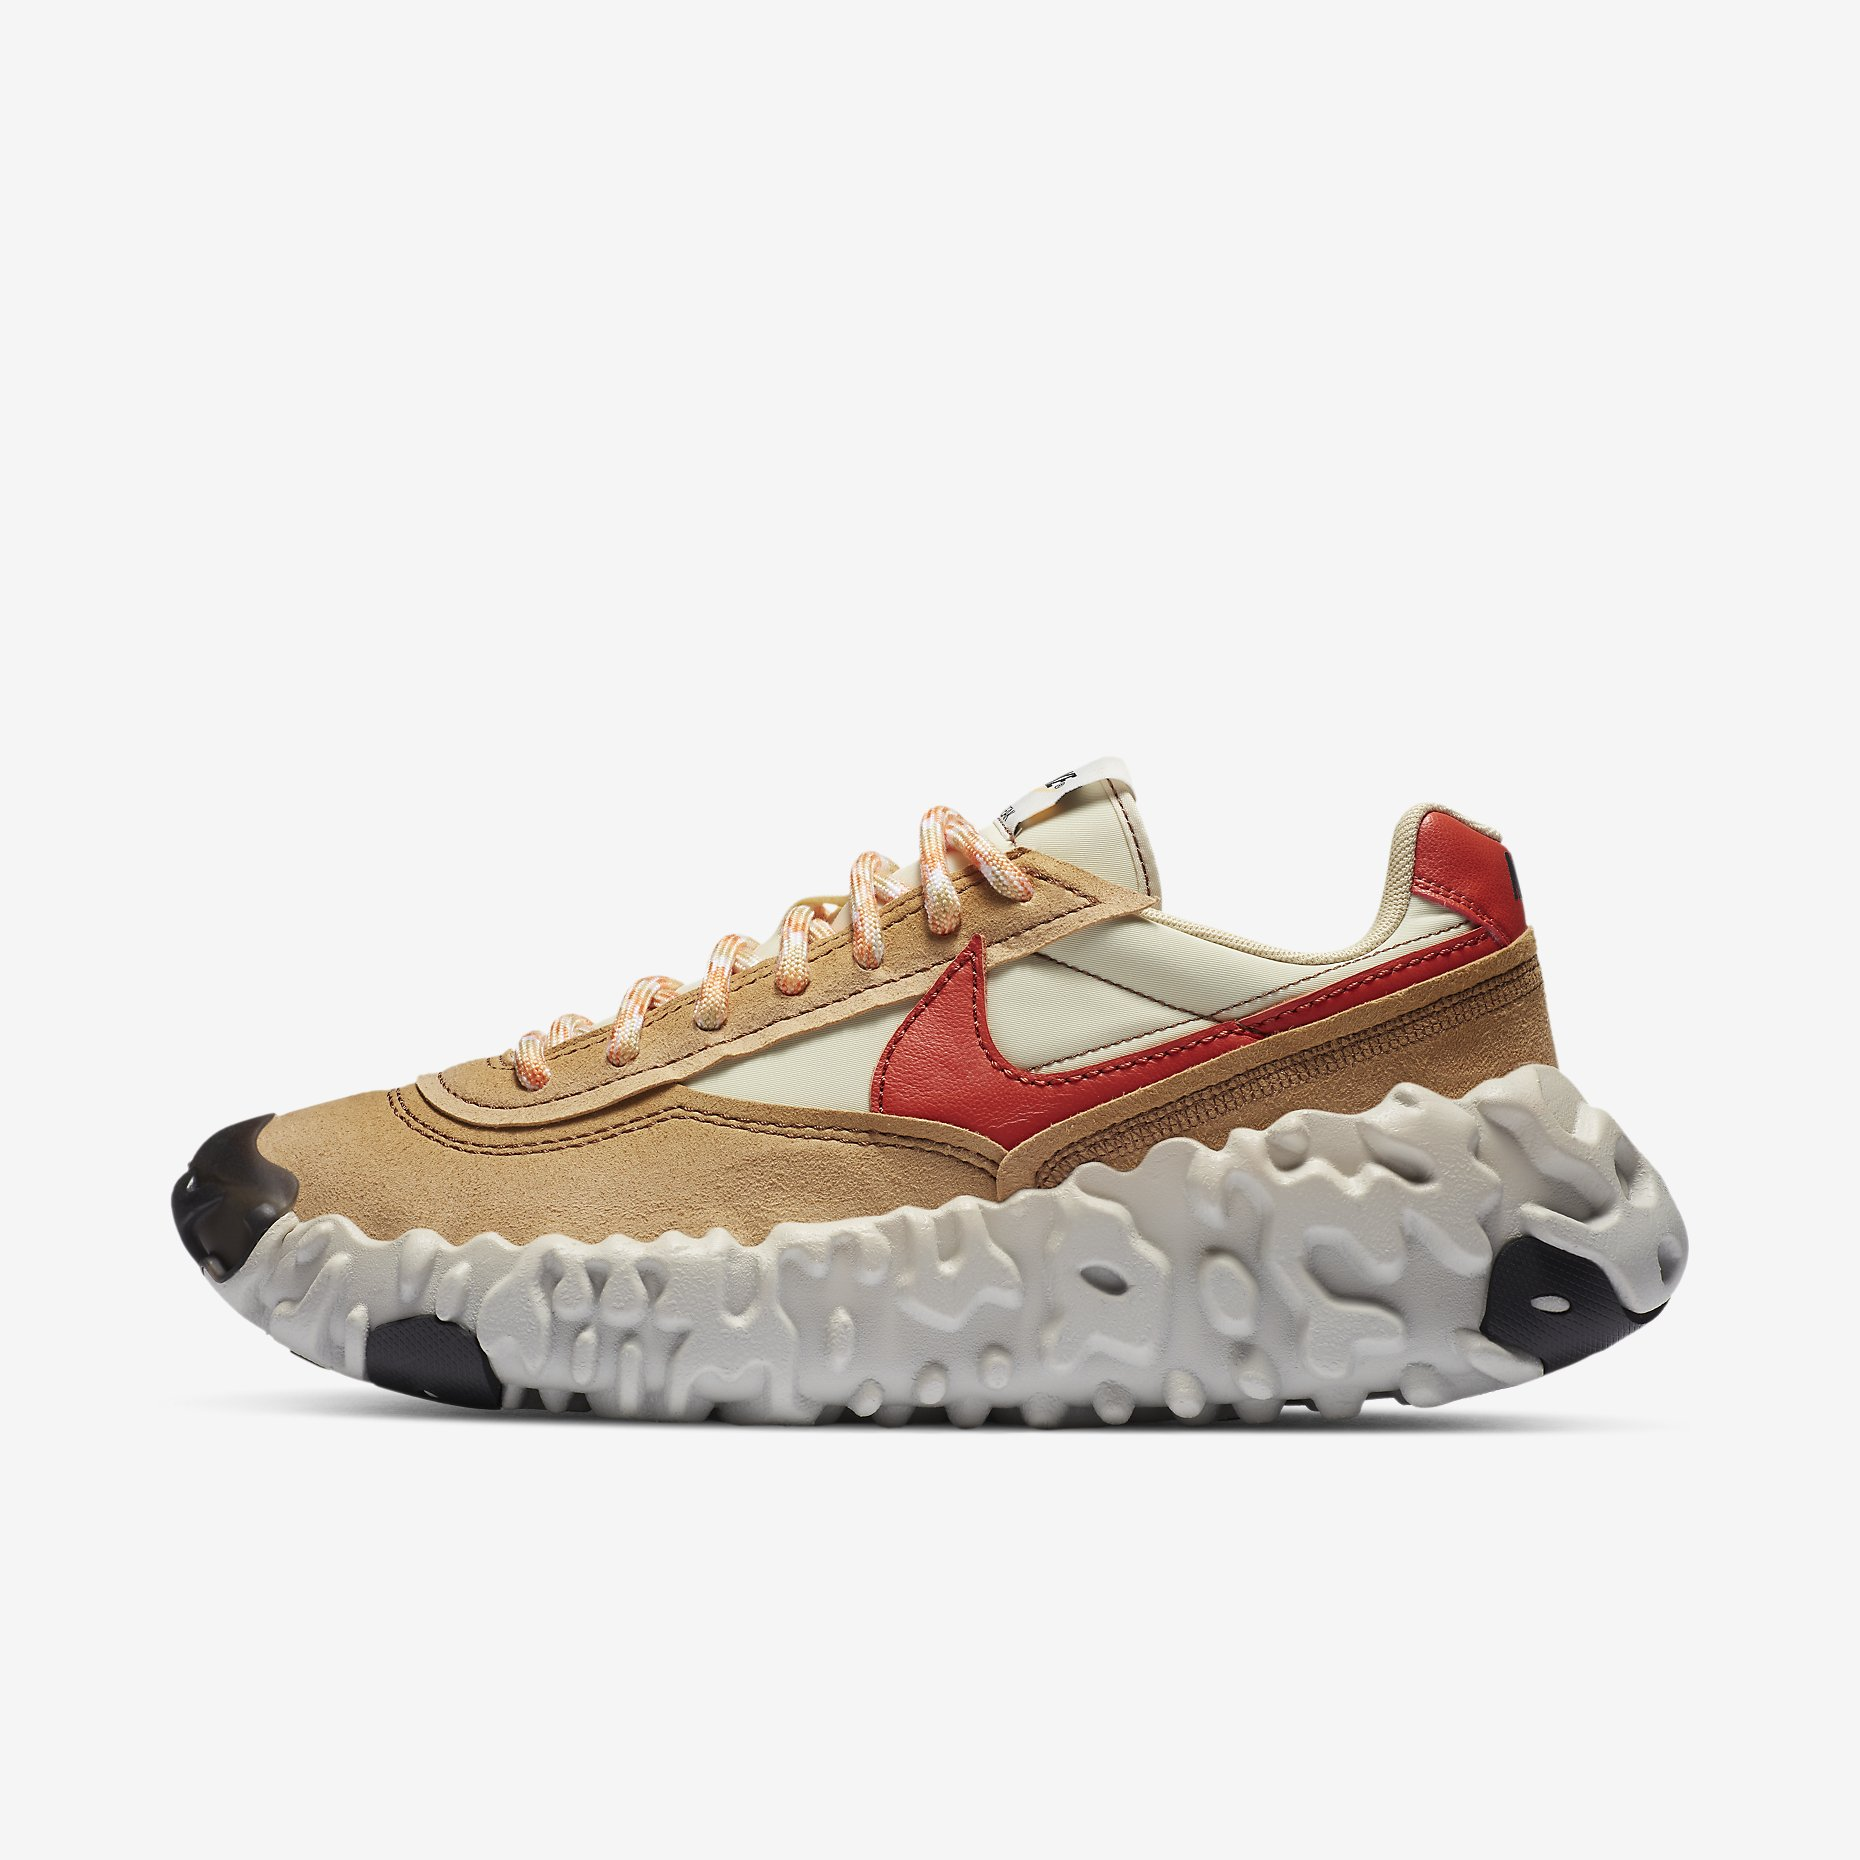 Nike Overbreak SP 'Fossil' - 'Mars Yard'}